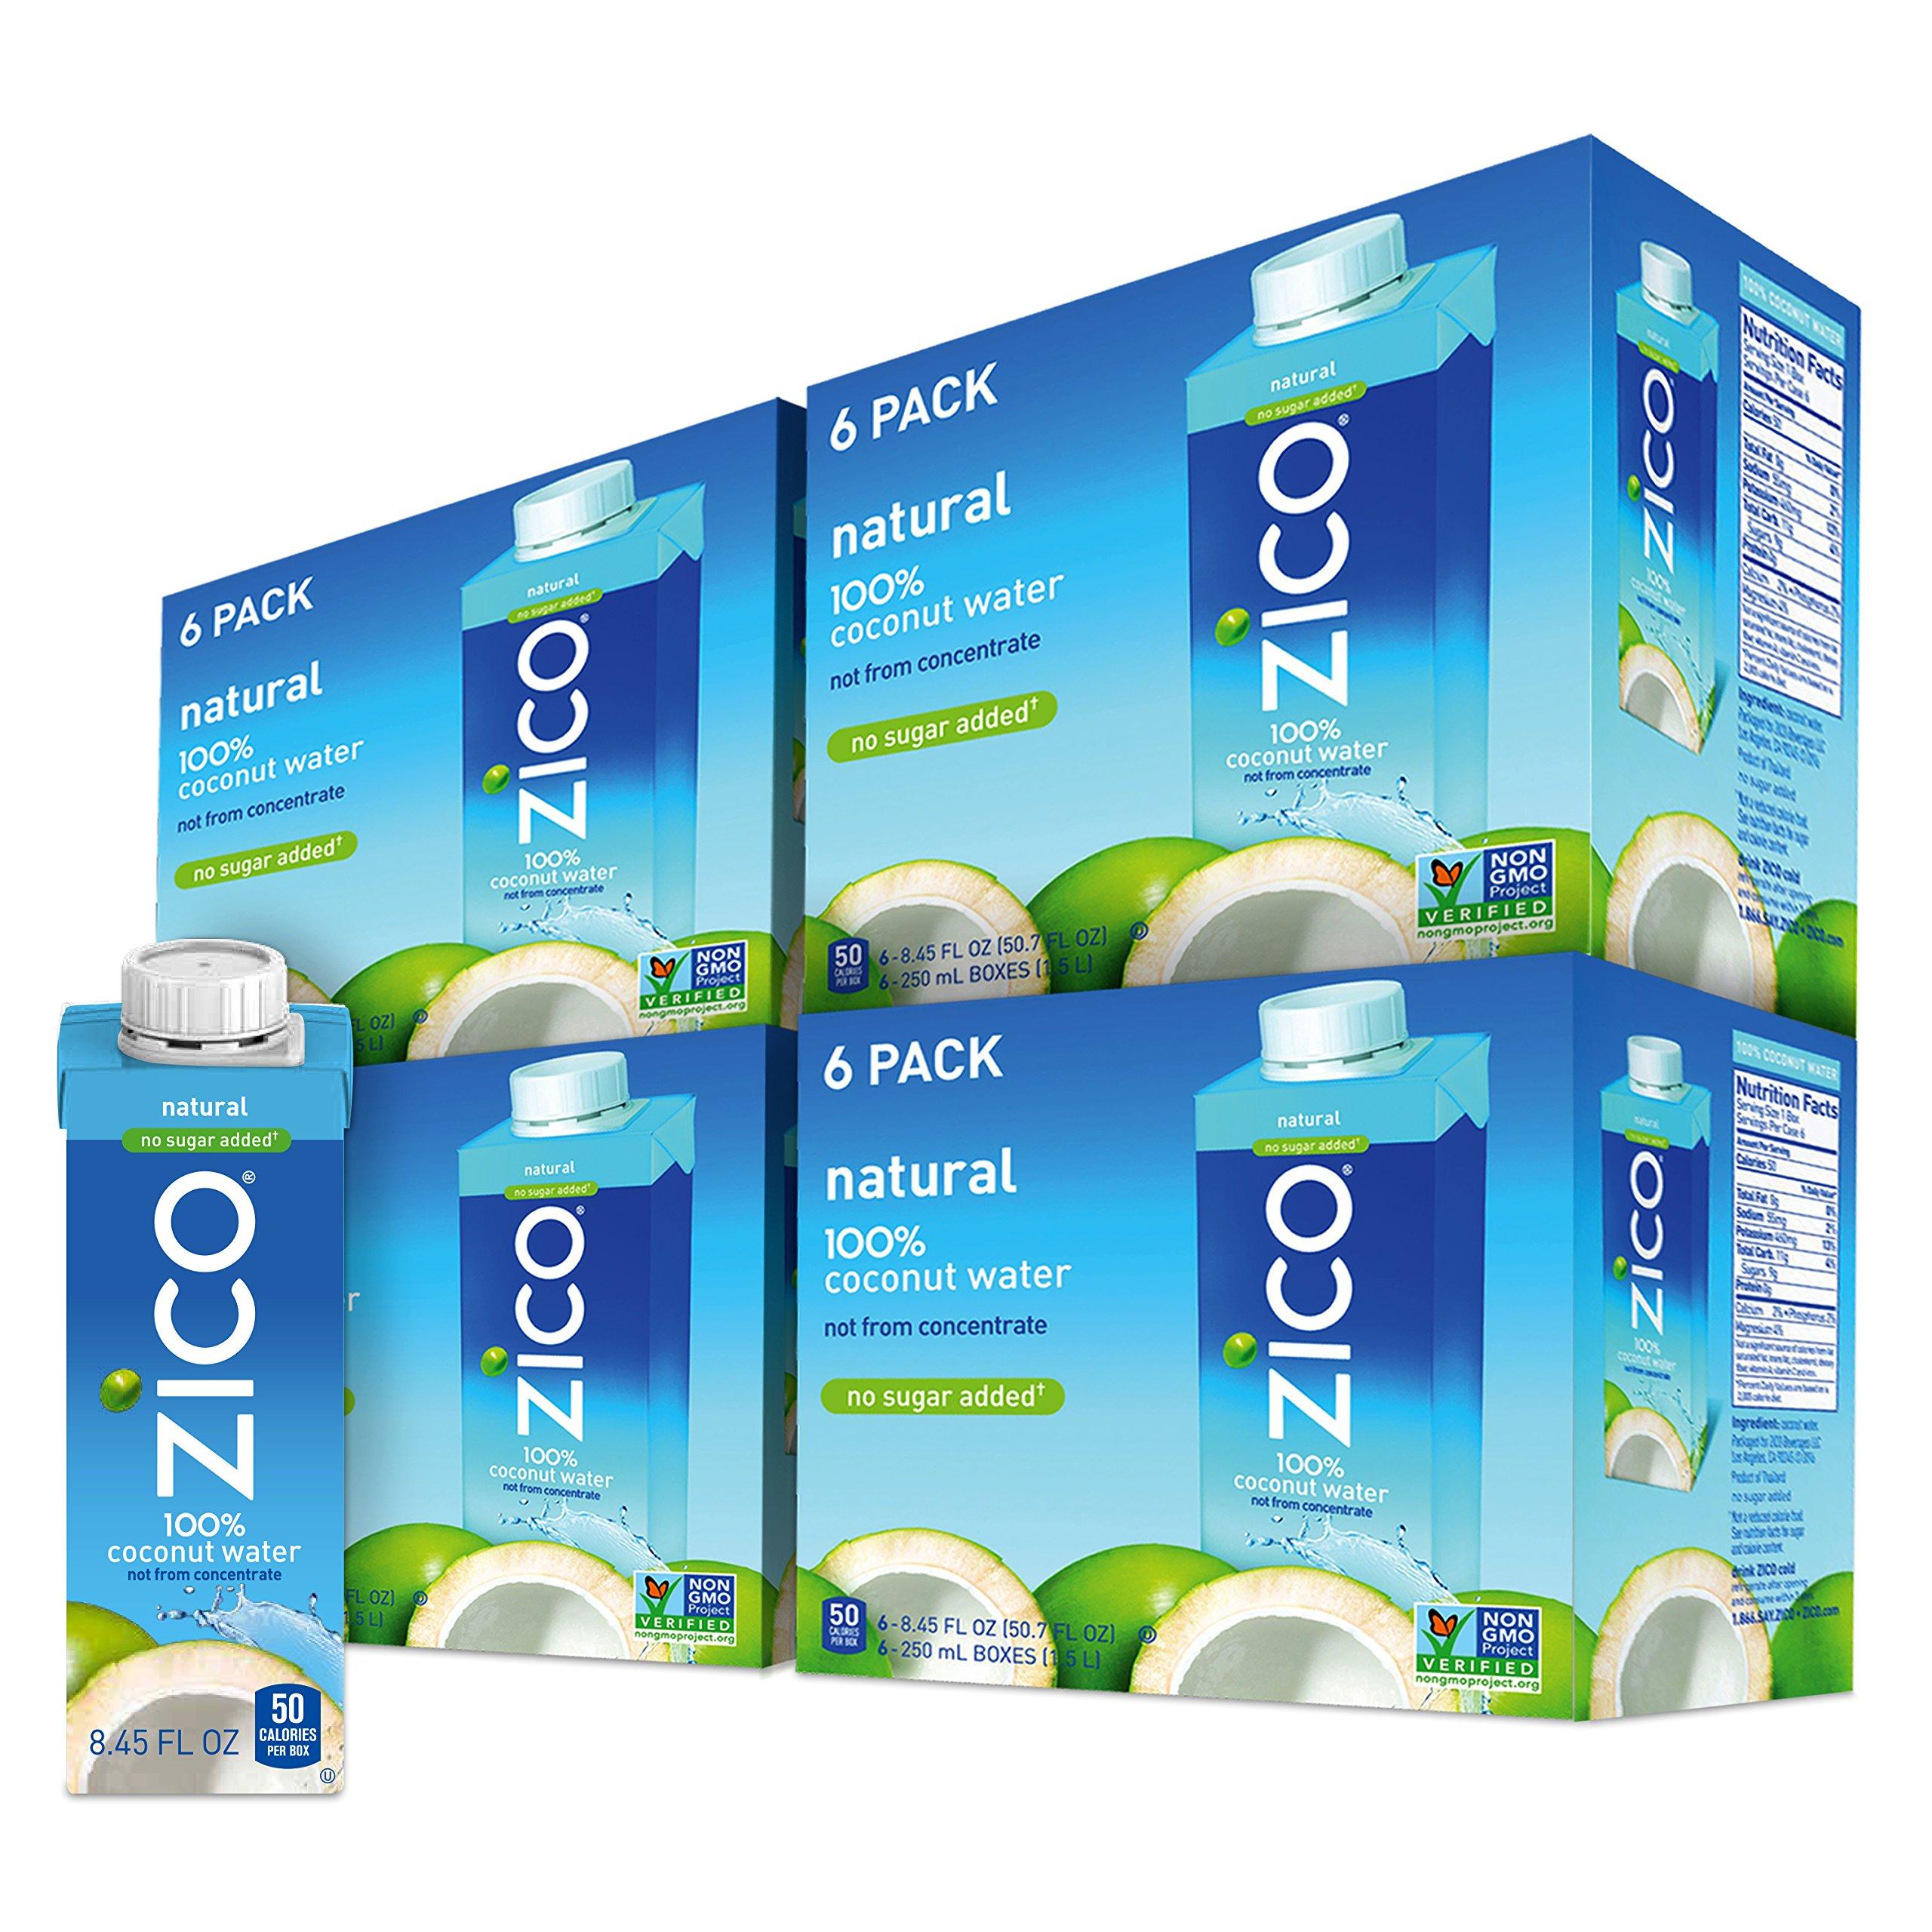 ZICO Premium Natural Coconut Water Drinks, No Sugar Added Gluten Free, 8.45 fl oz, 24 Pack